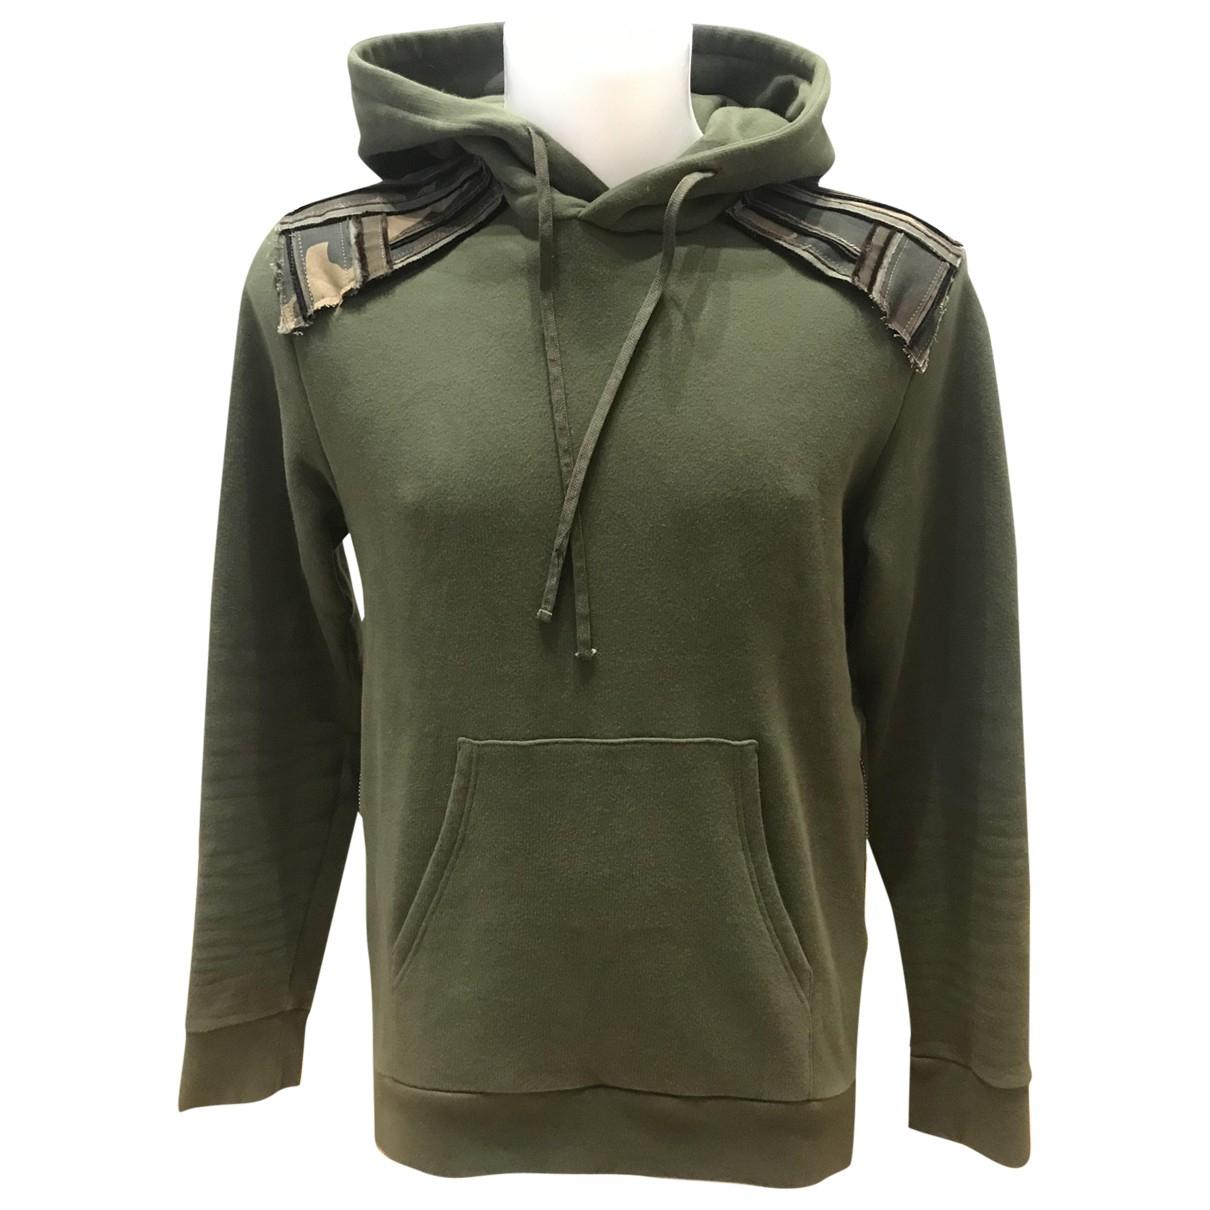 Balmain \N Green Cotton Knitwear & Sweatshirts for Men S International